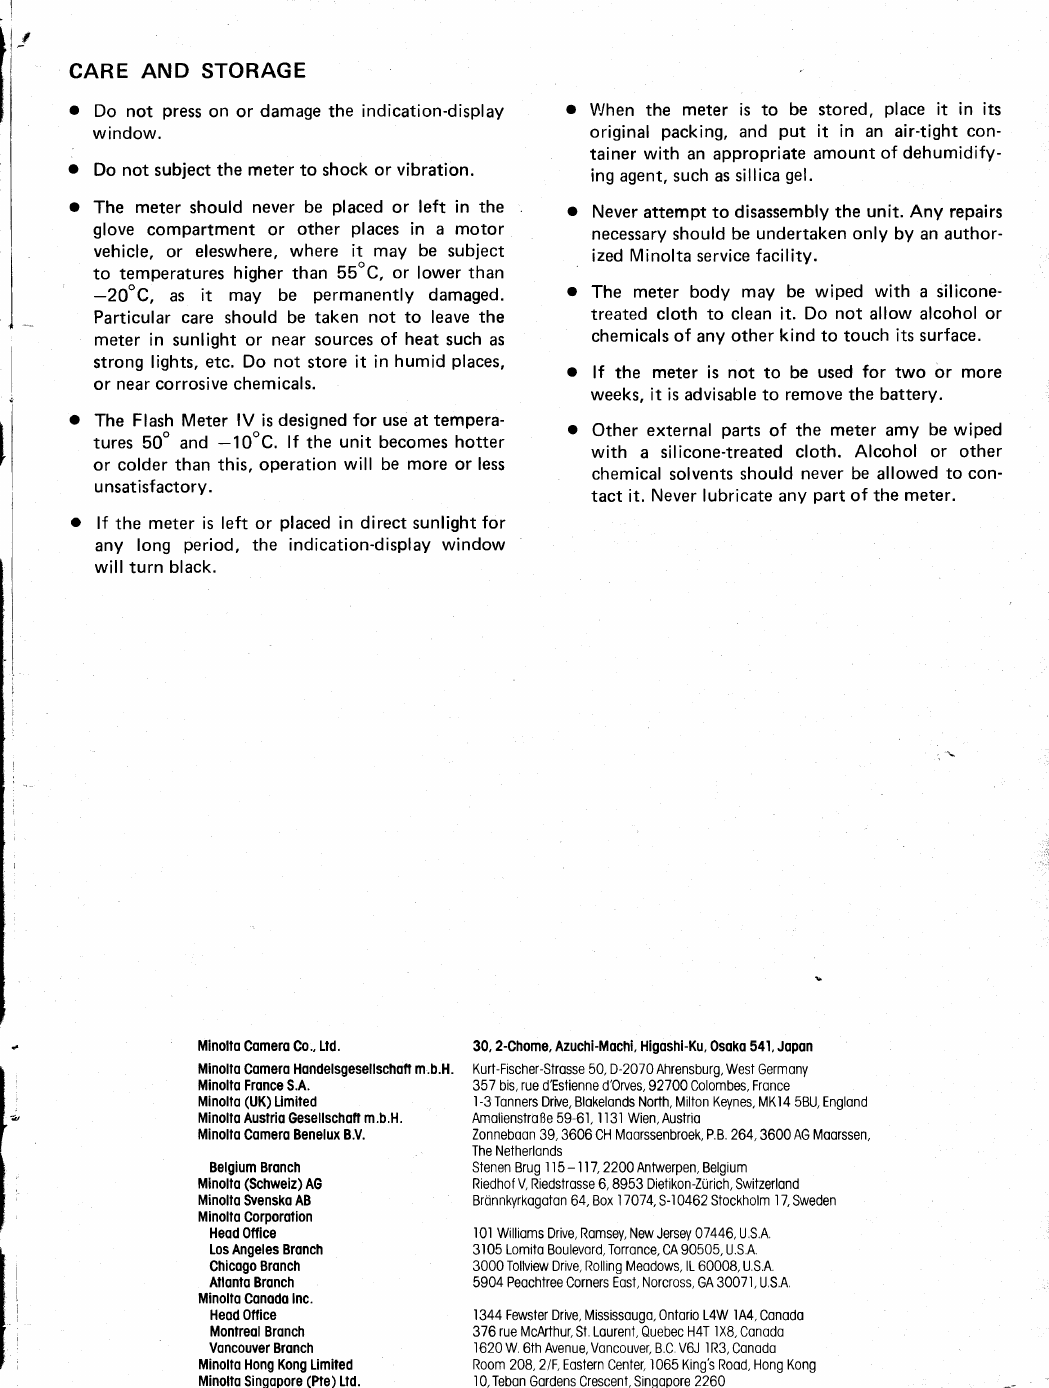 Handleiding Minolta Flash Meter IV (pagina 42 van 44) (English)